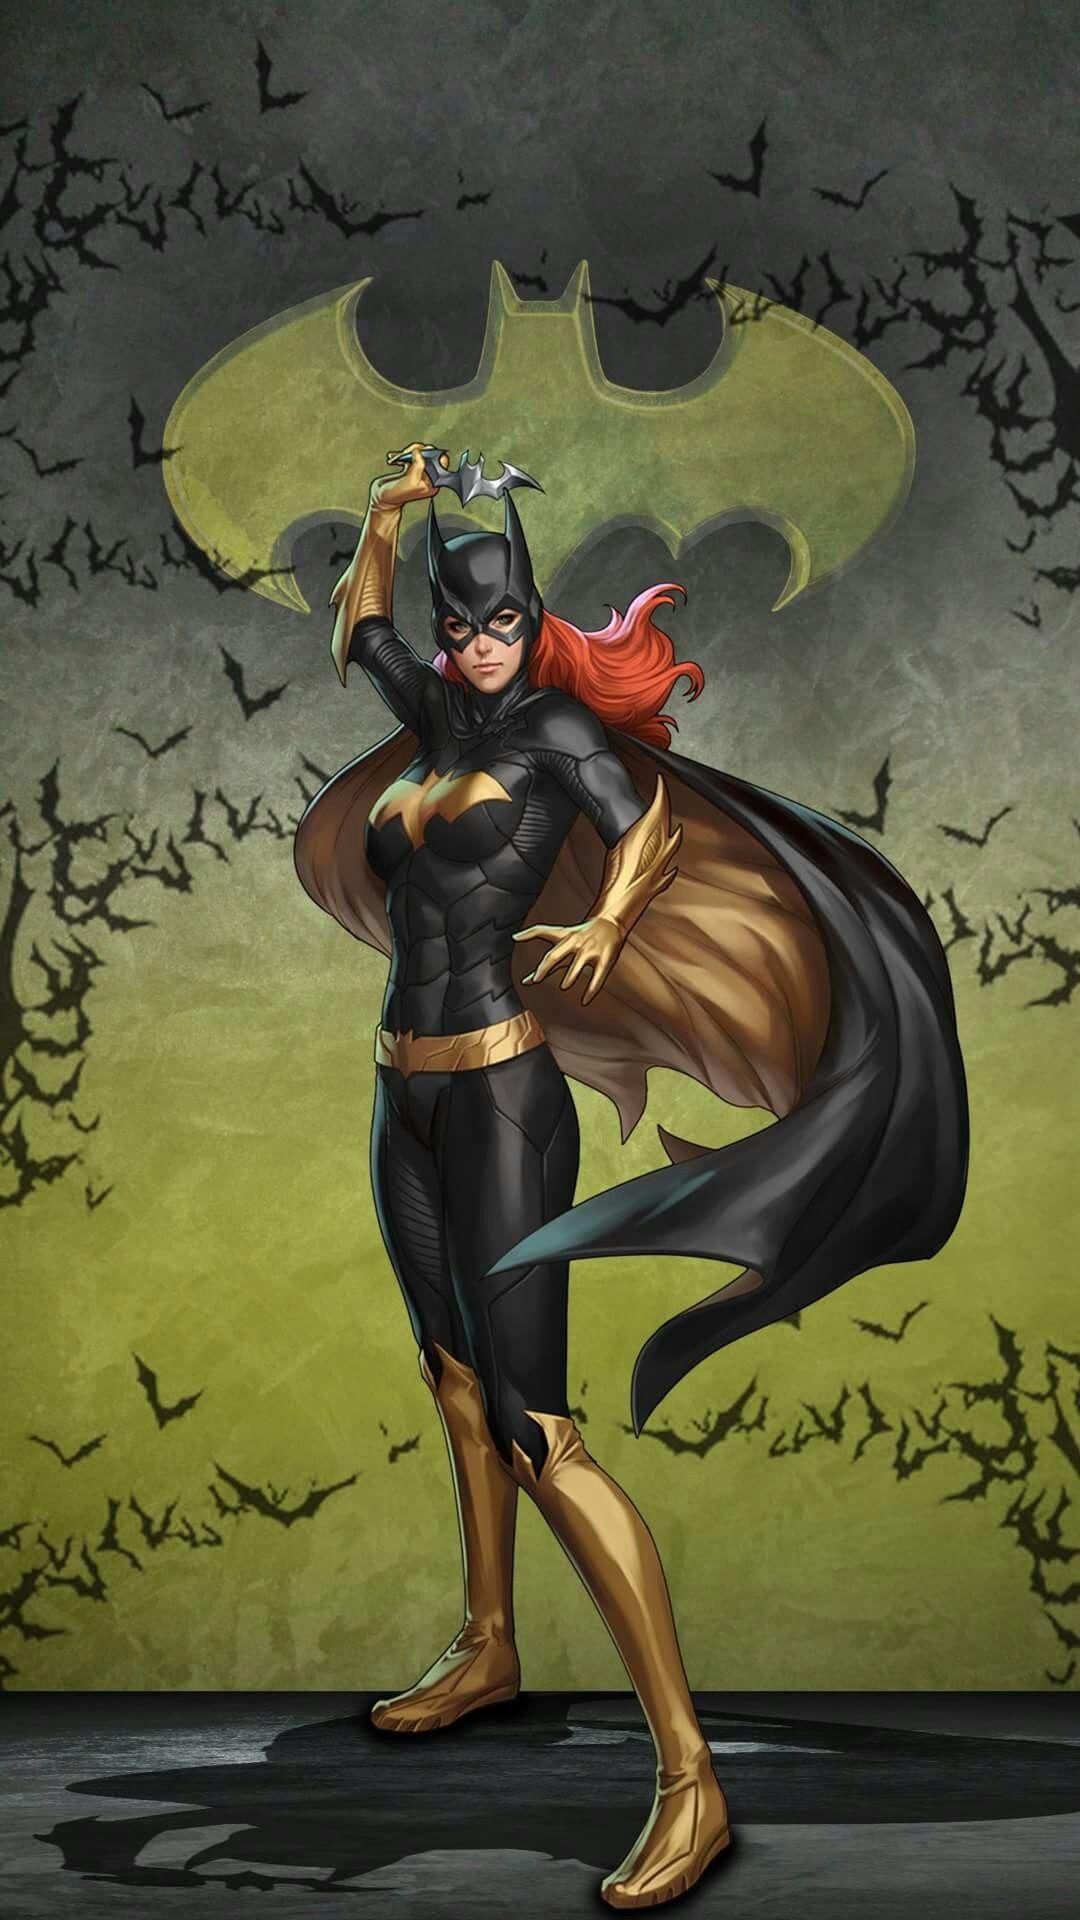 Pin by Jimmie B. Hartwell on Comics Superhero art